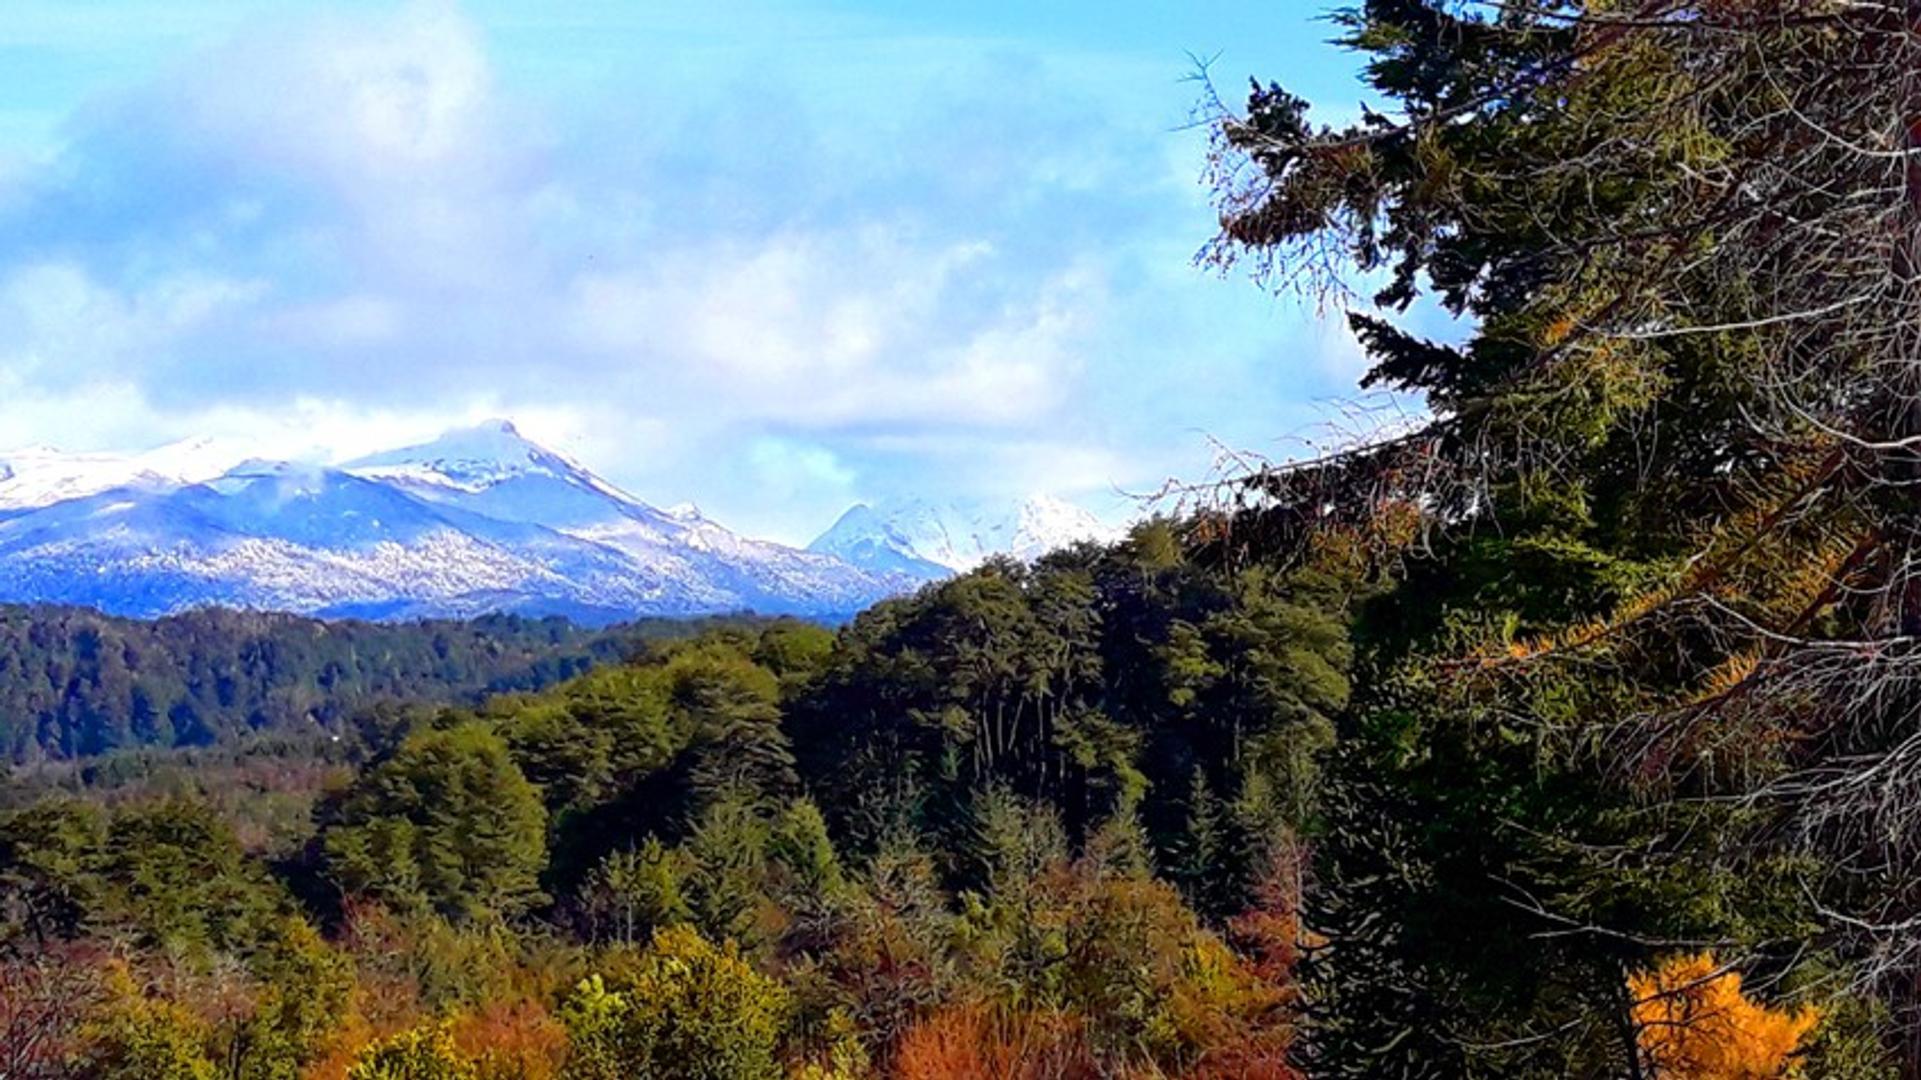 Espectacular lote en Country Cumelen , Villa la Angostura